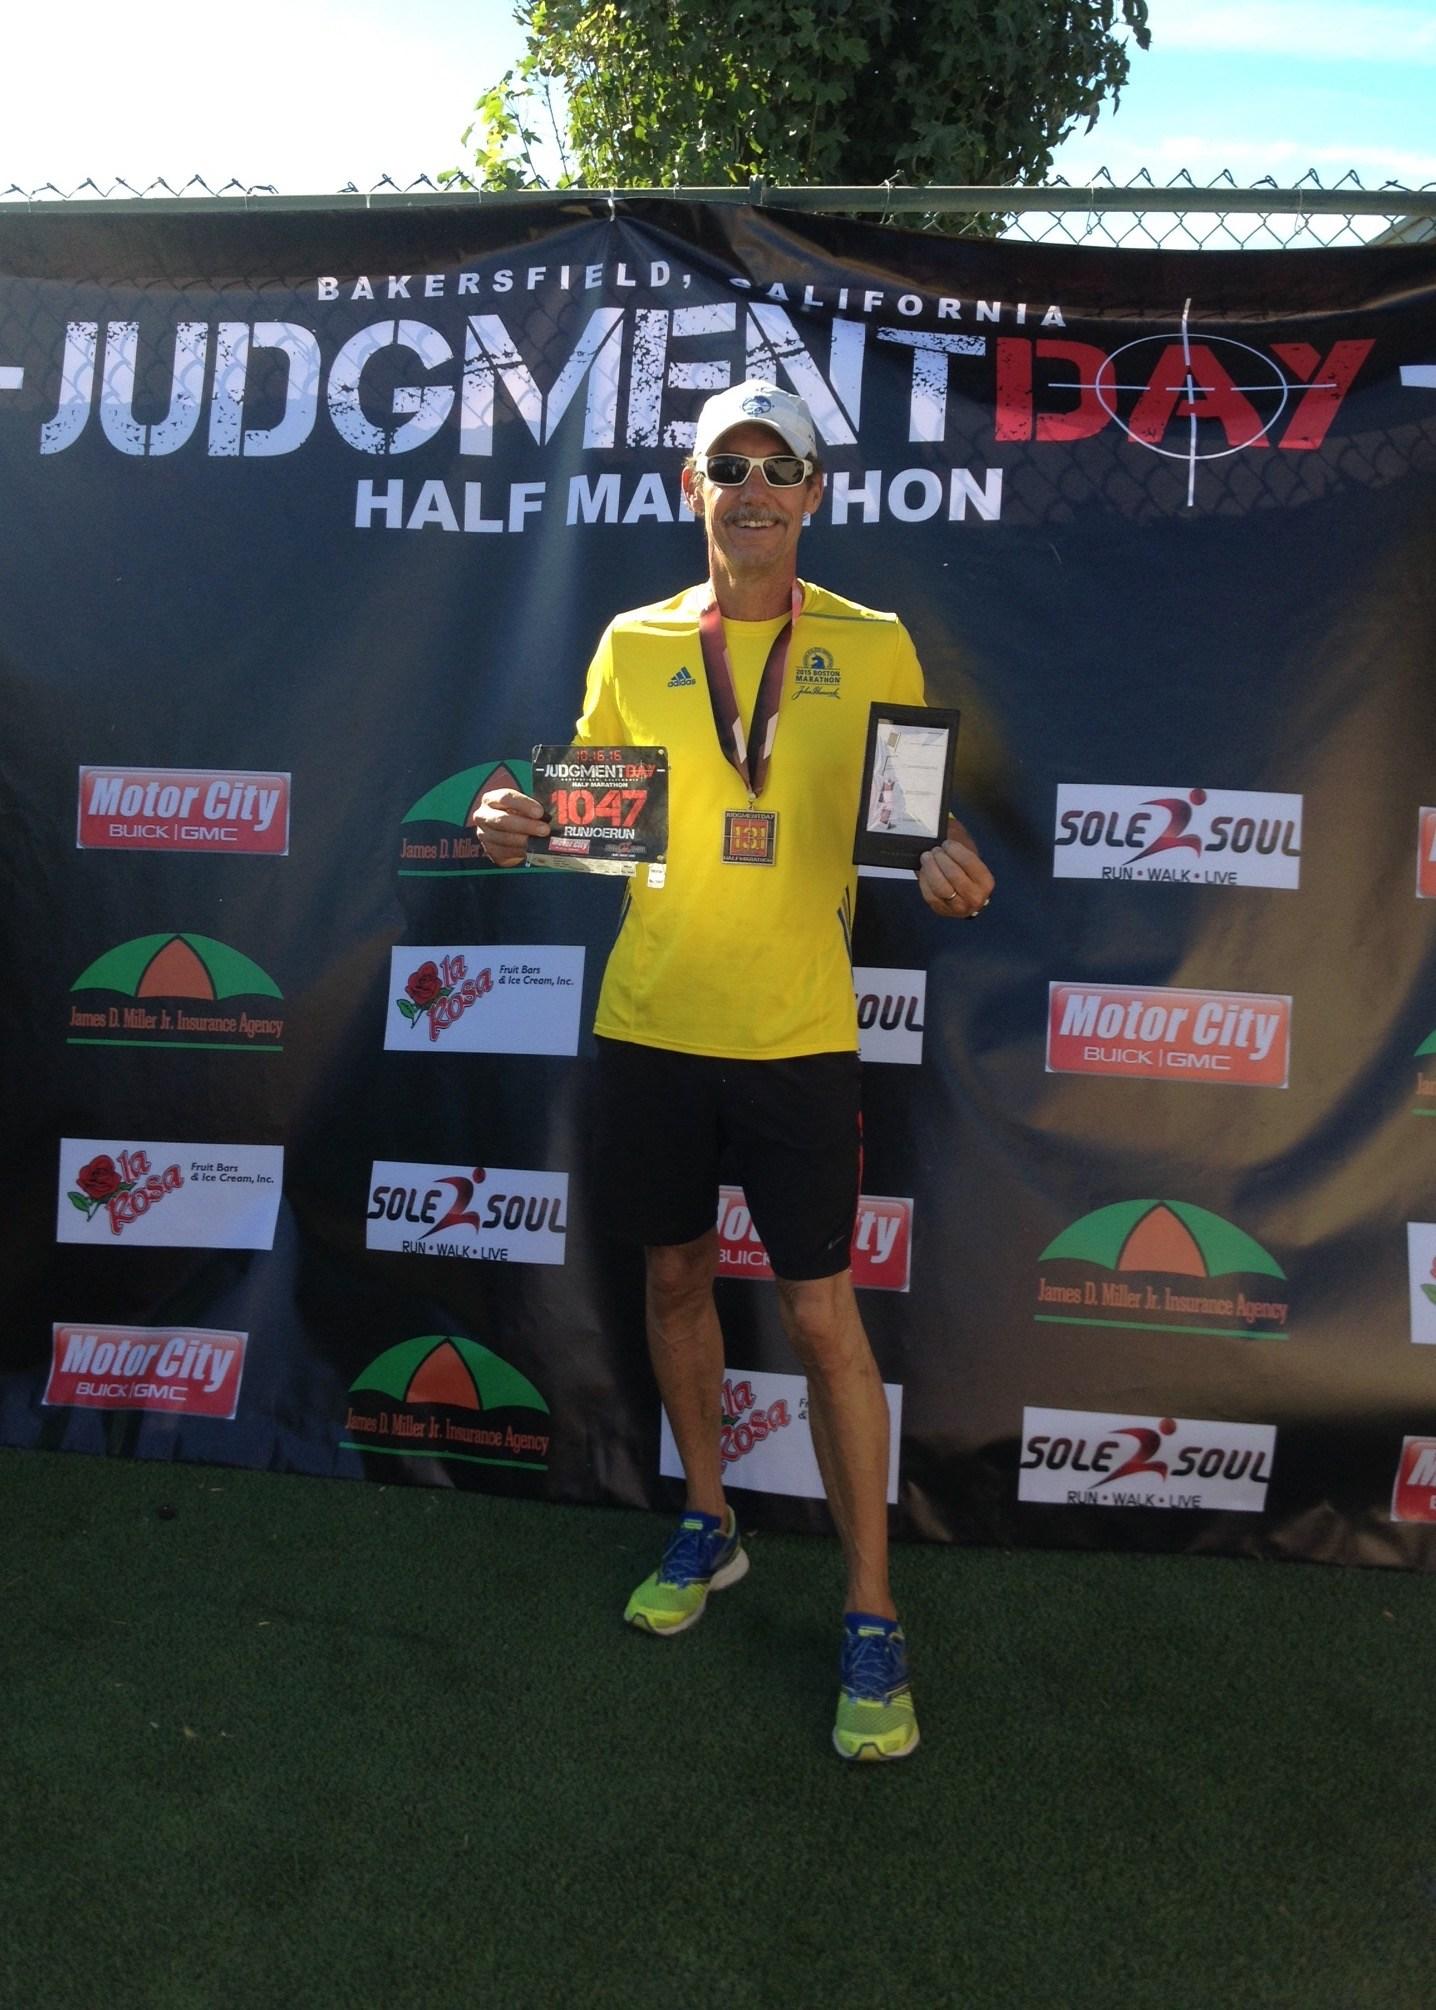 Holding first place half marathon award